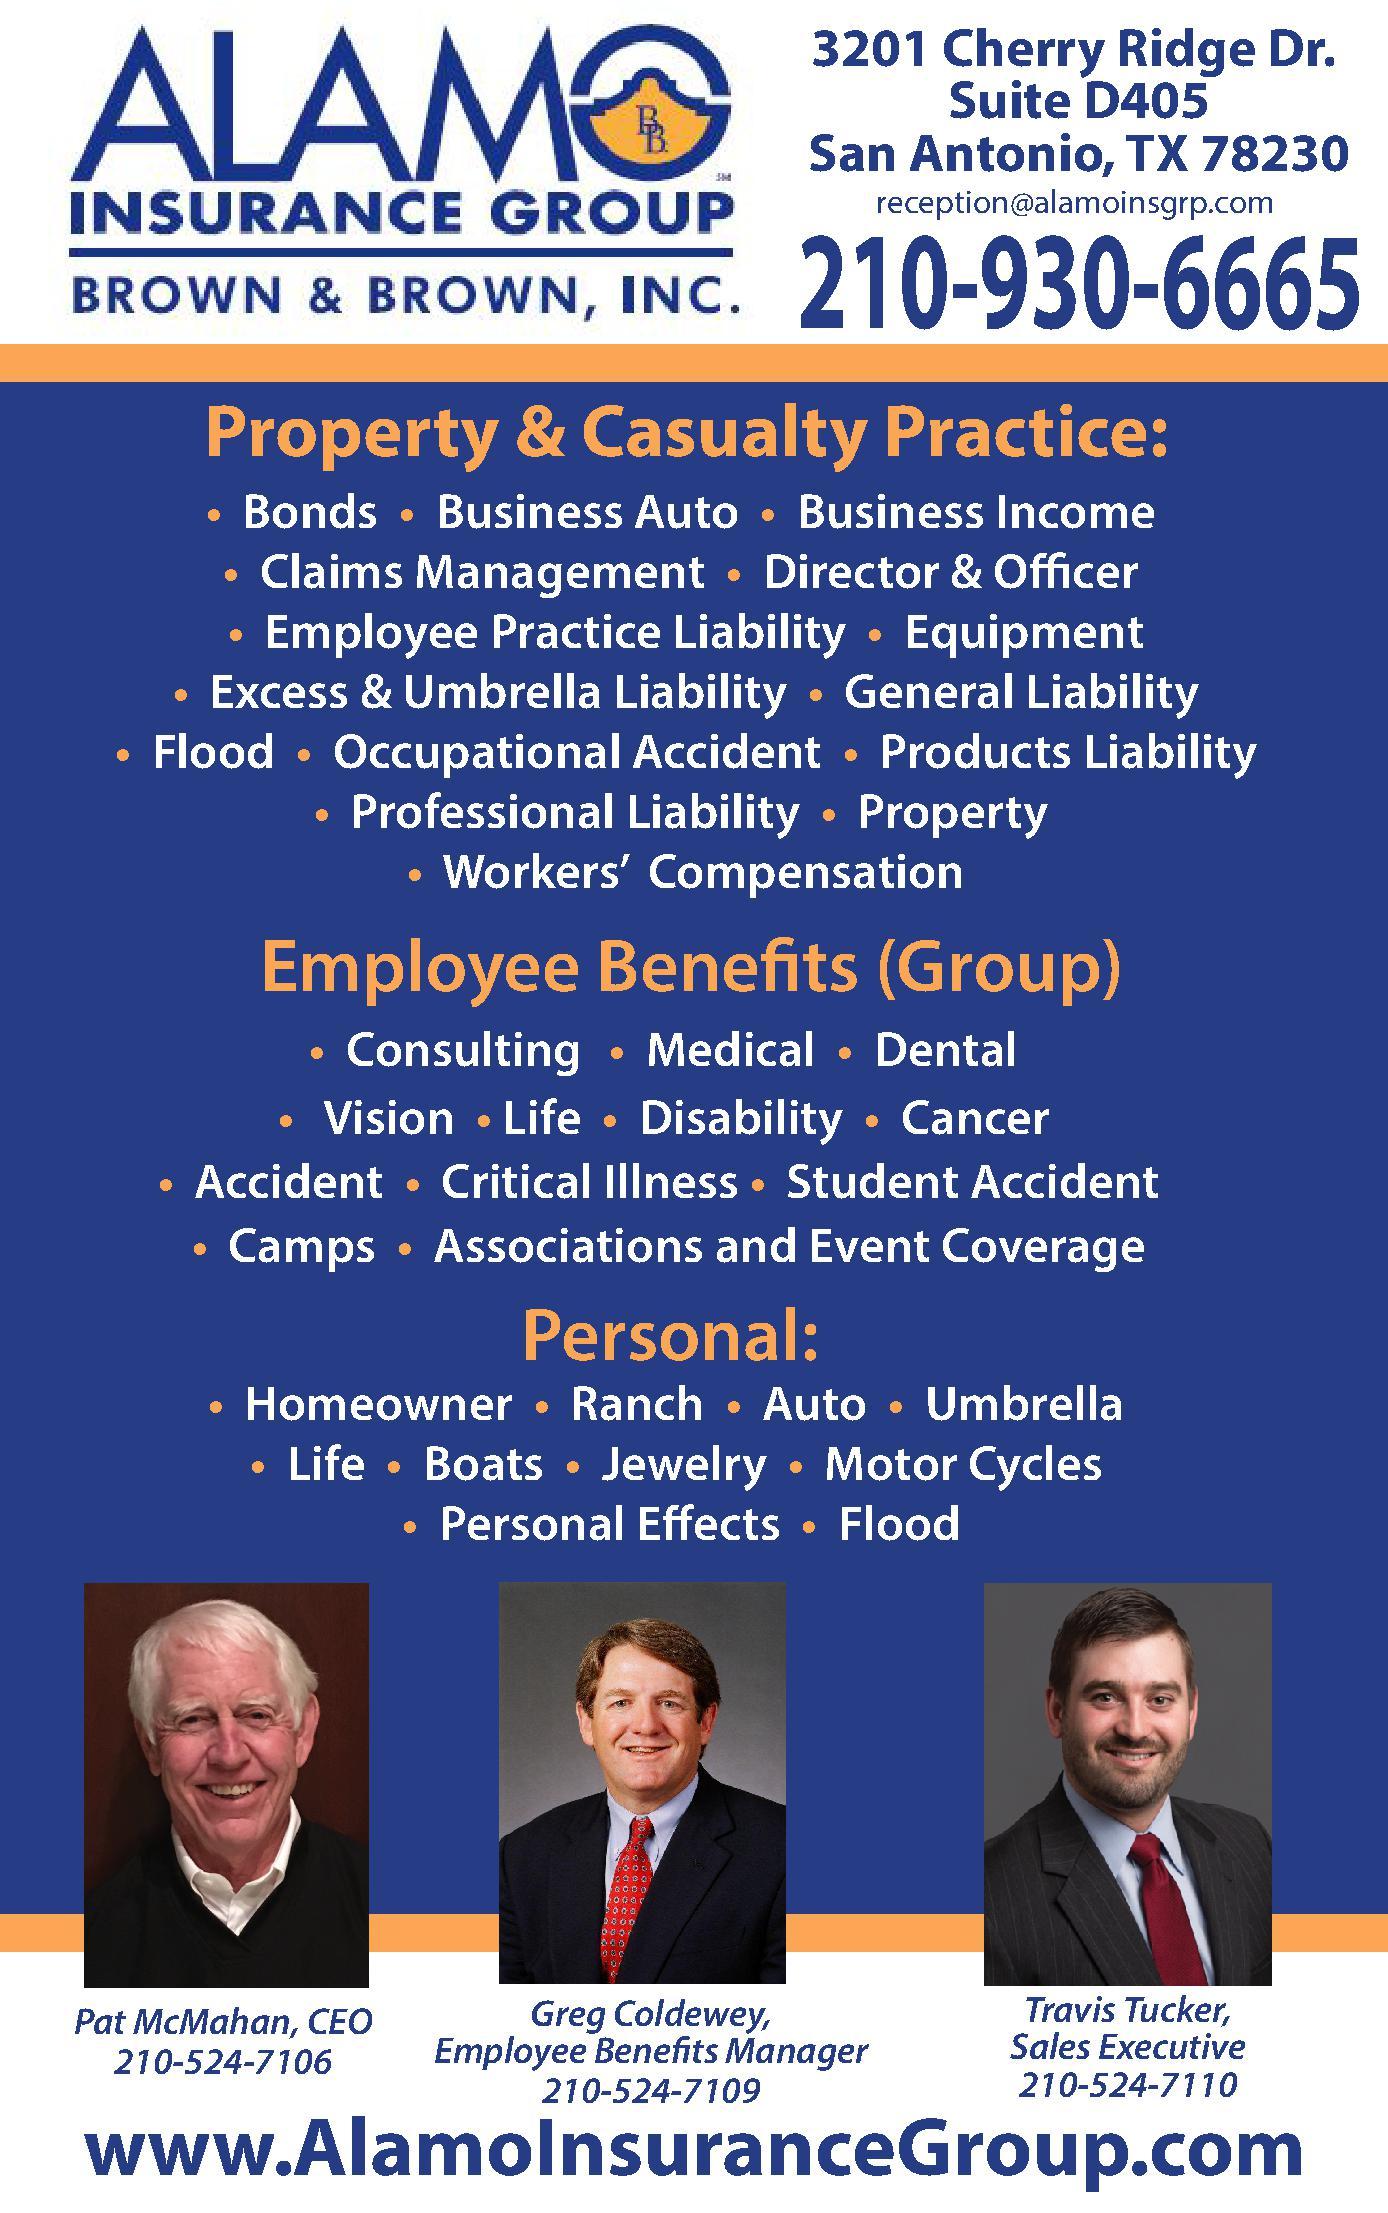 Alamo Insurance Group